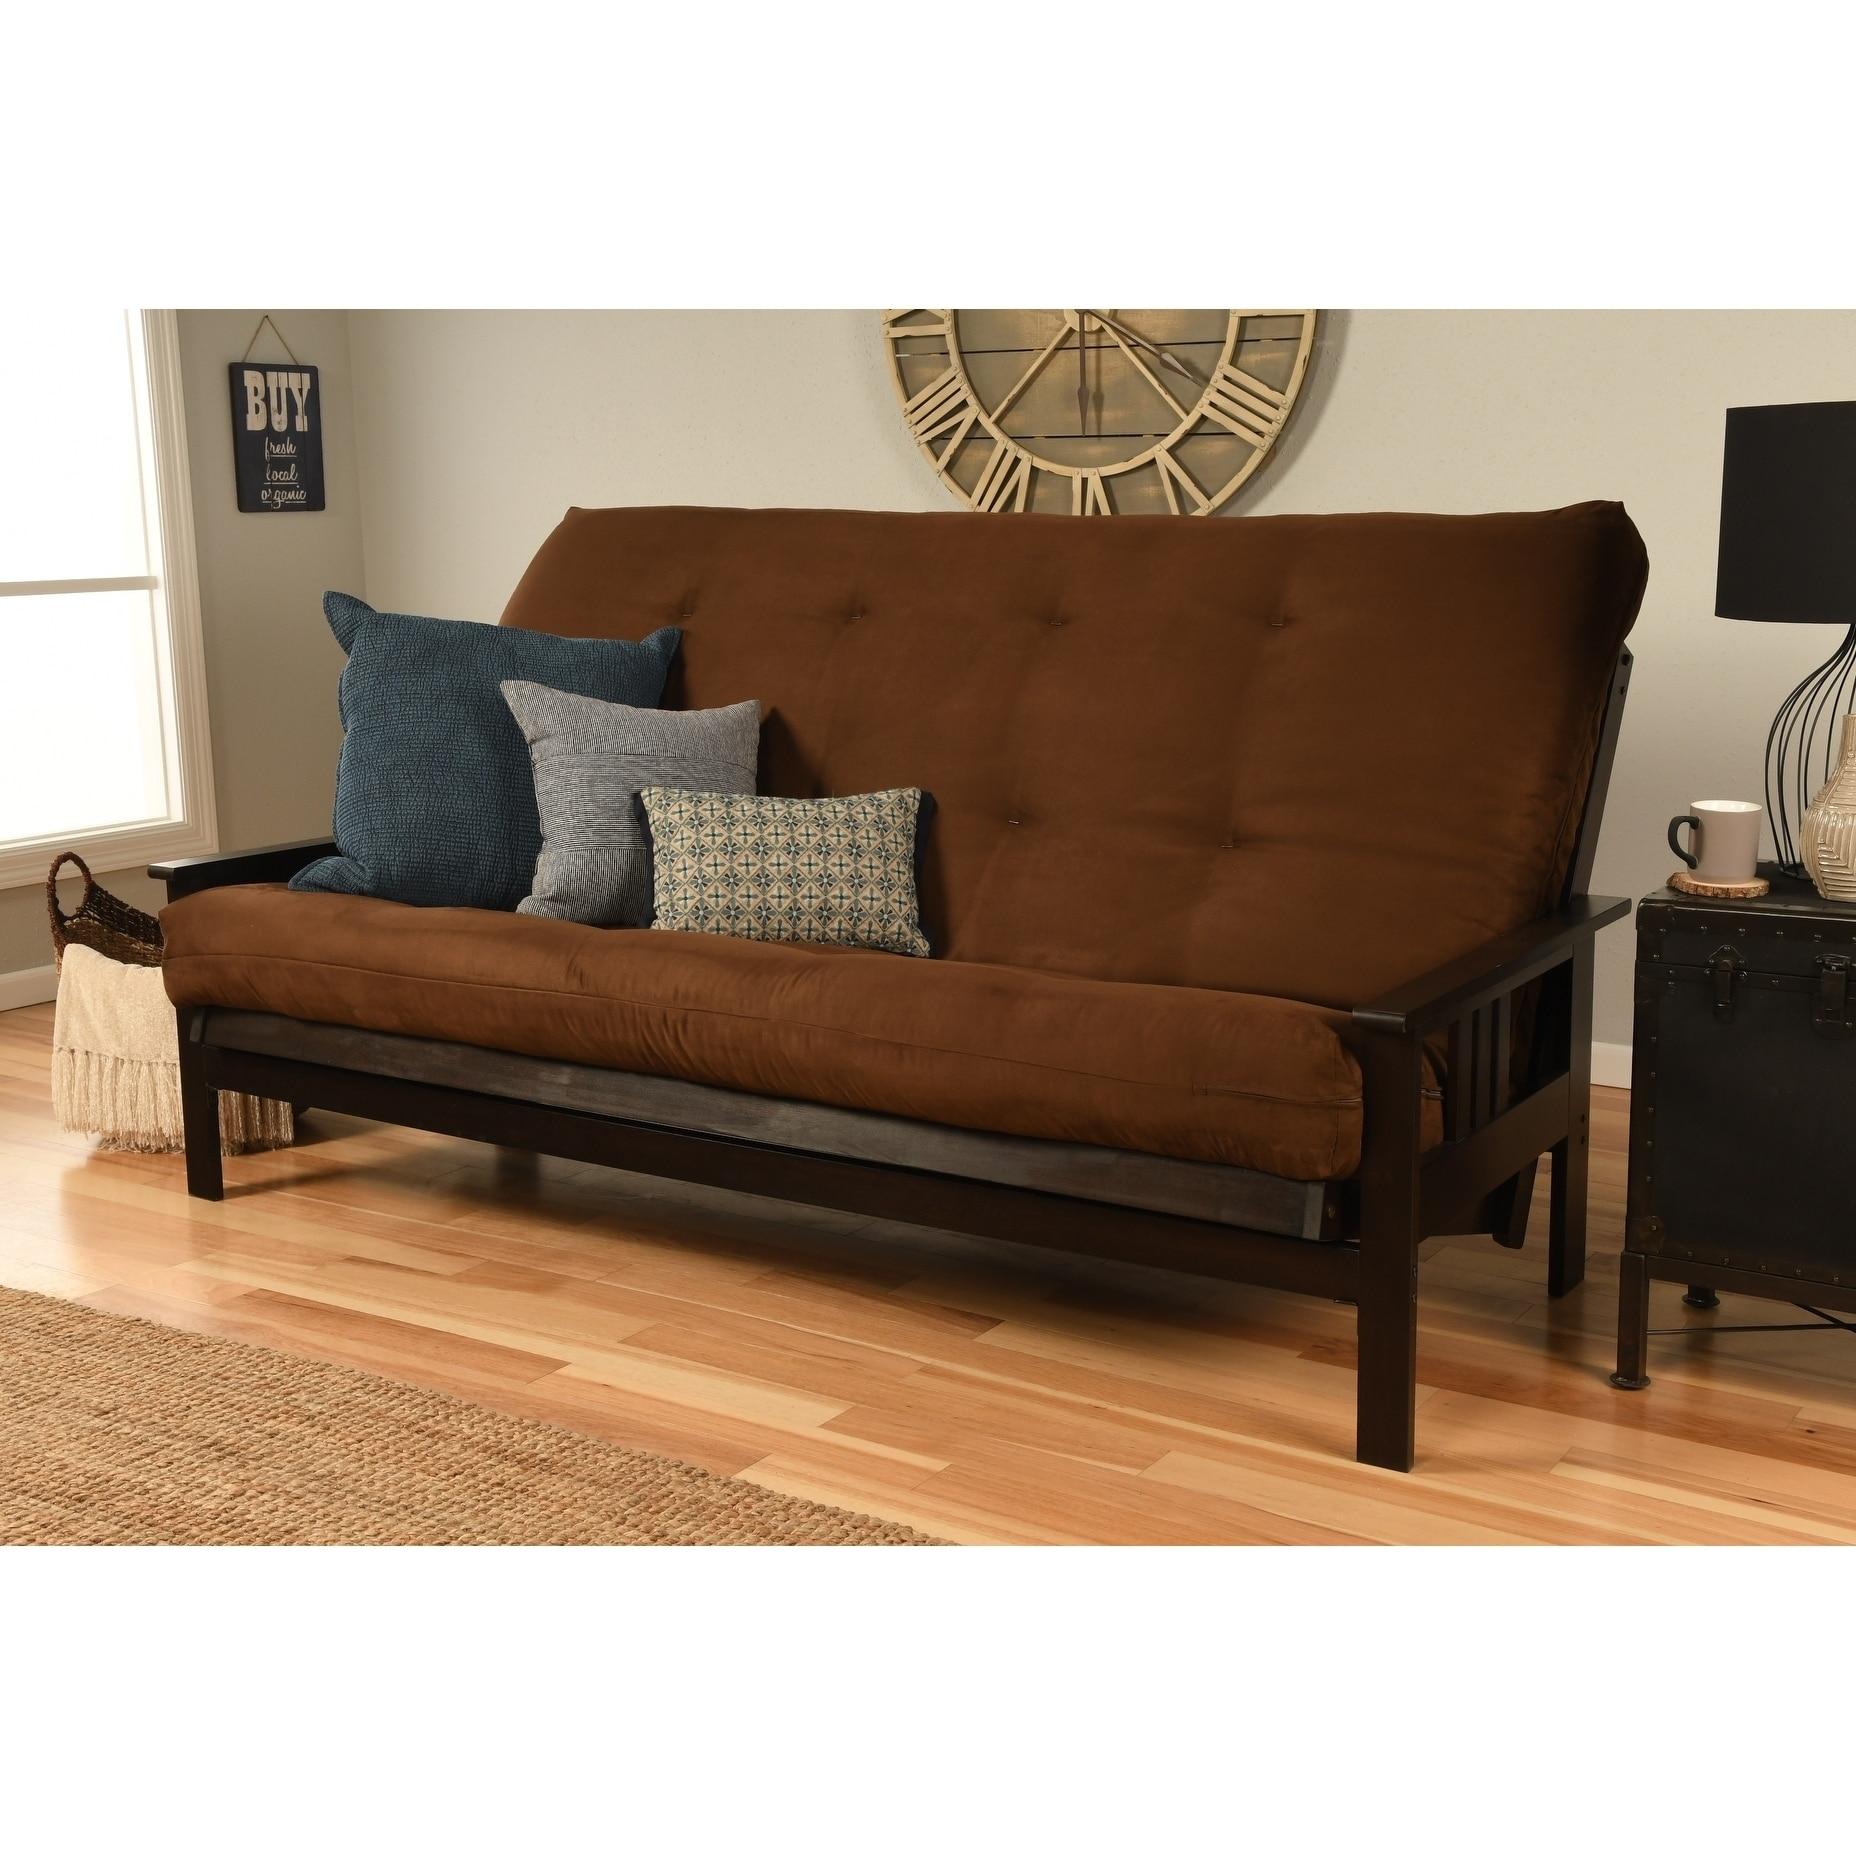 Suede Queen Size Futon Sofa Bed